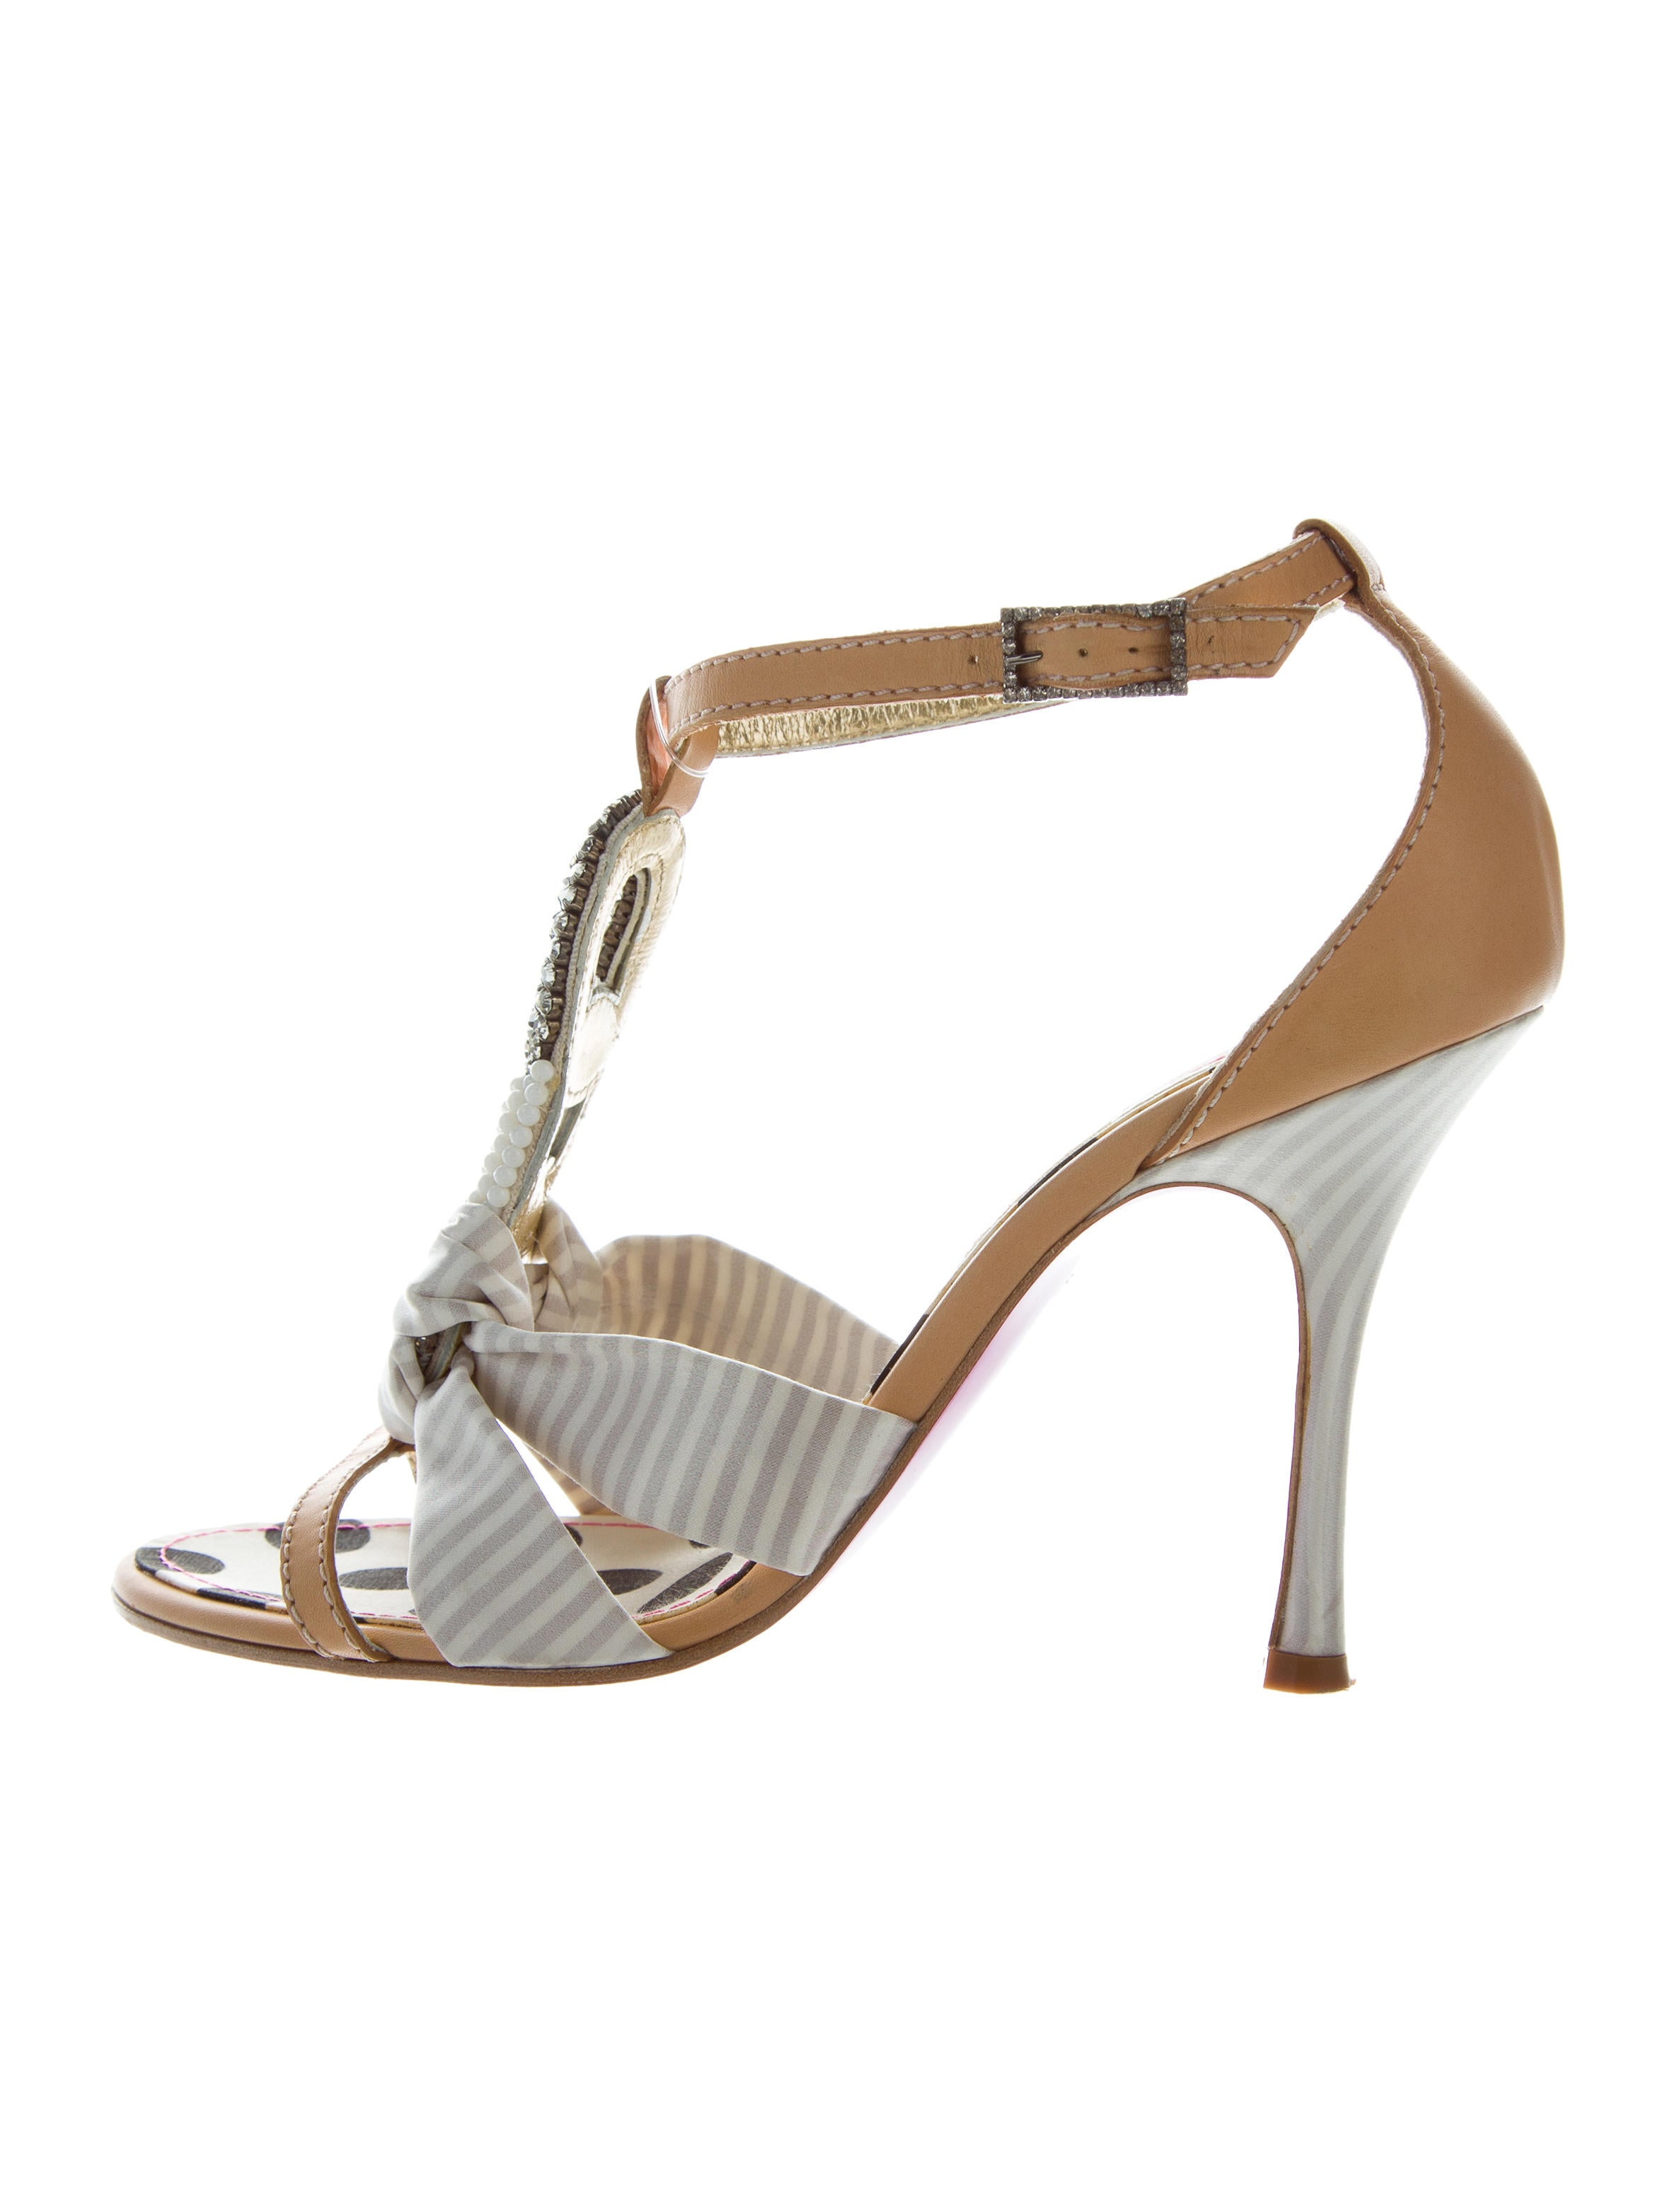 Christian Lacroix Embellished Satin Sandals Shoes